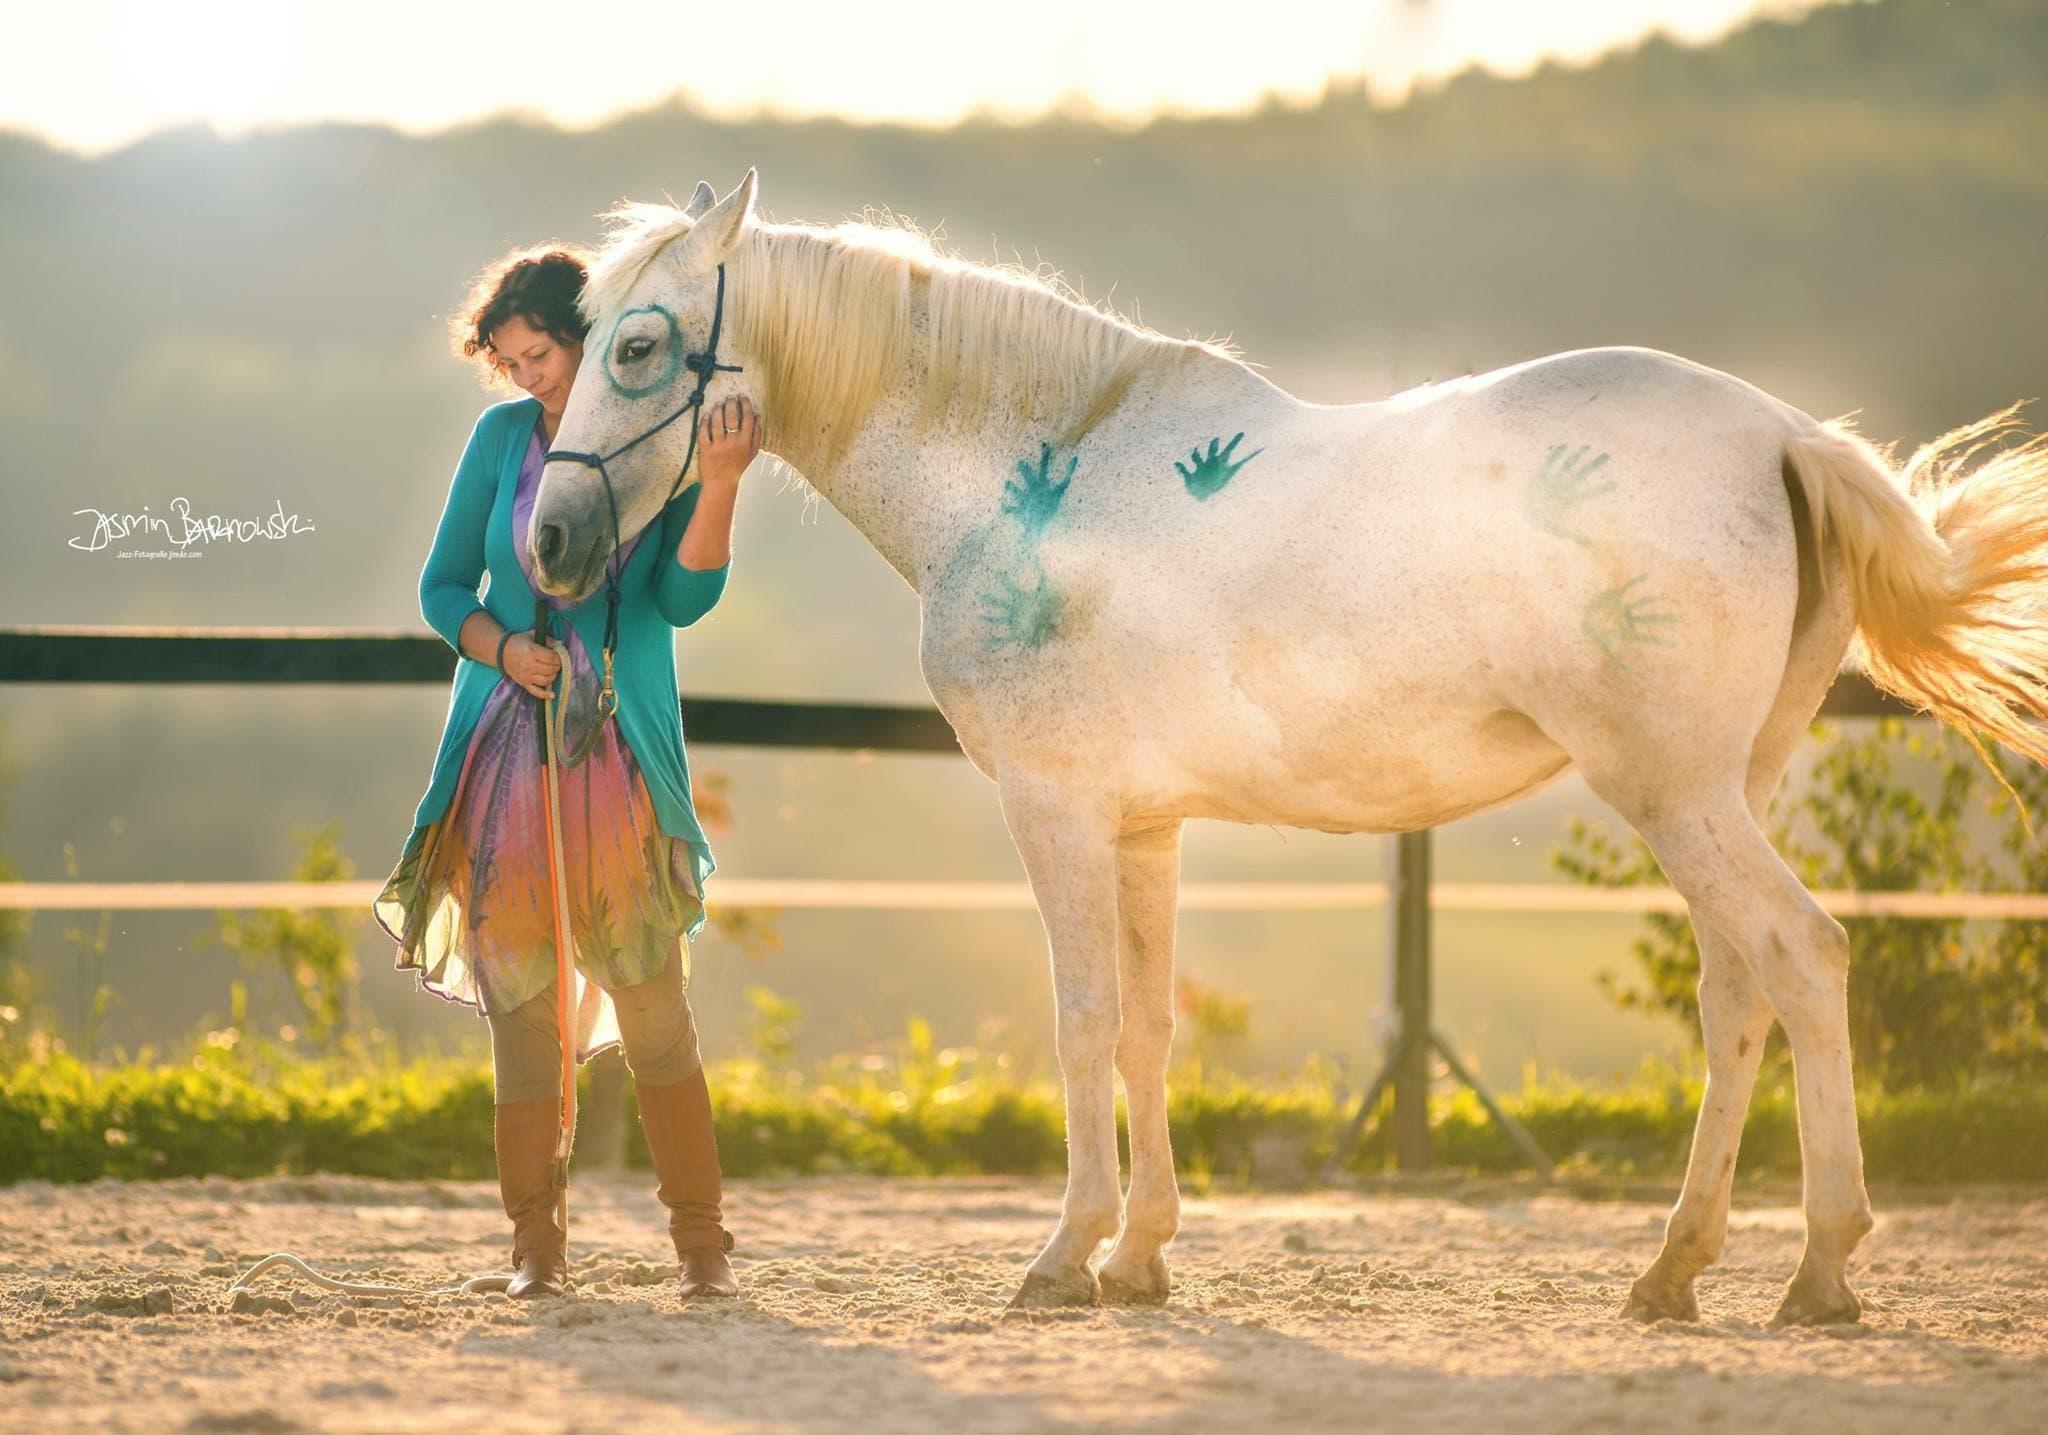 Lilia Christina Martiny mit ihrem Pferd